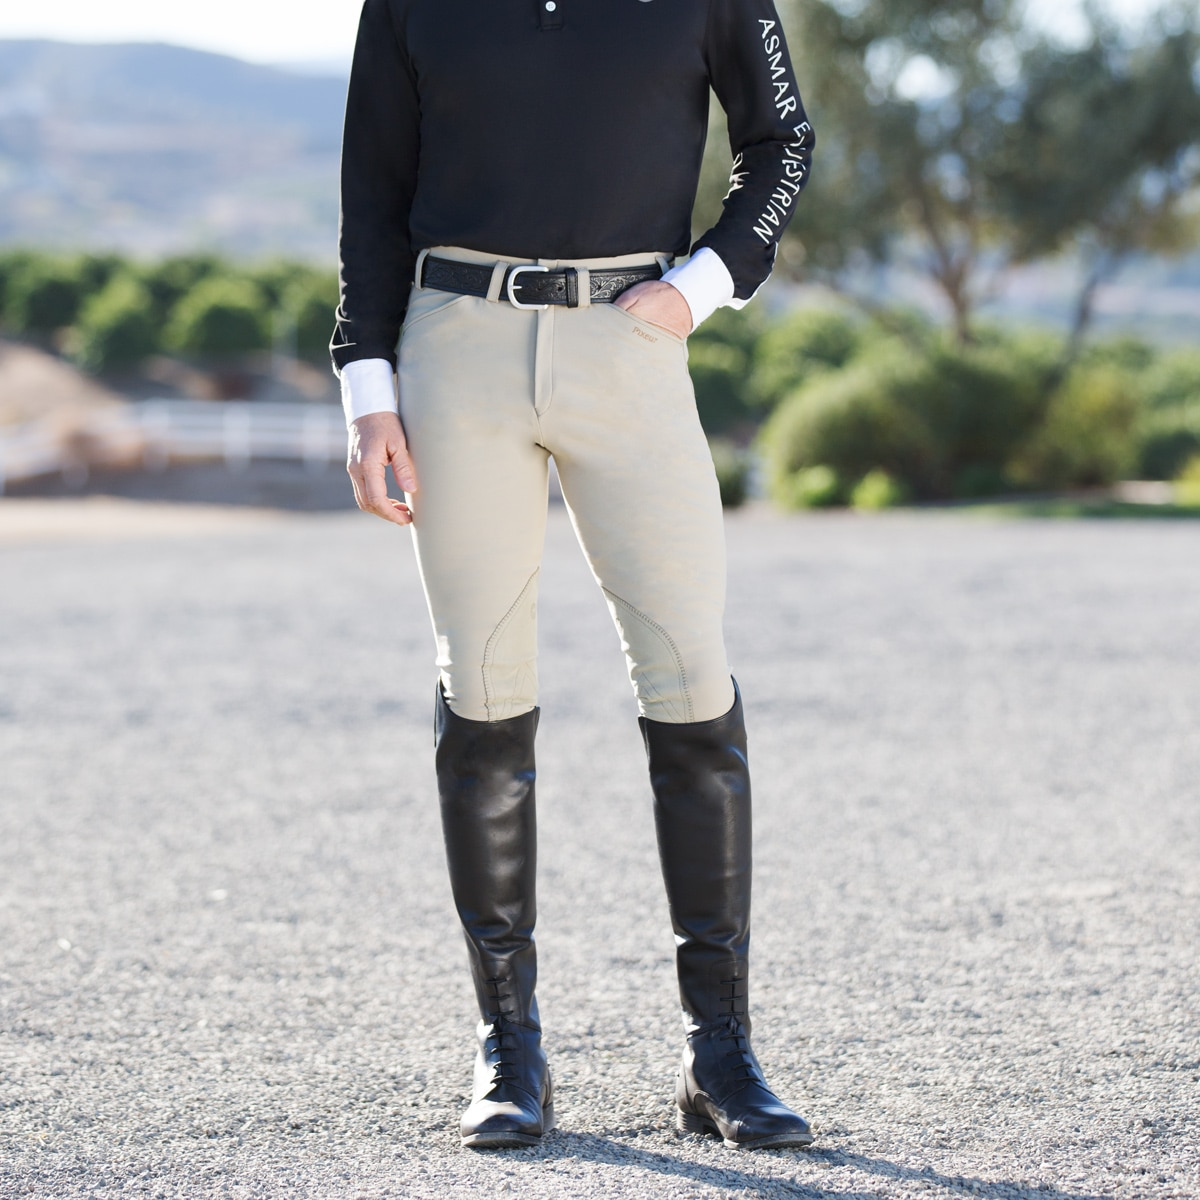 Mens Angled Pockets Breeches with Knee Patches Rodrigo Pikeur